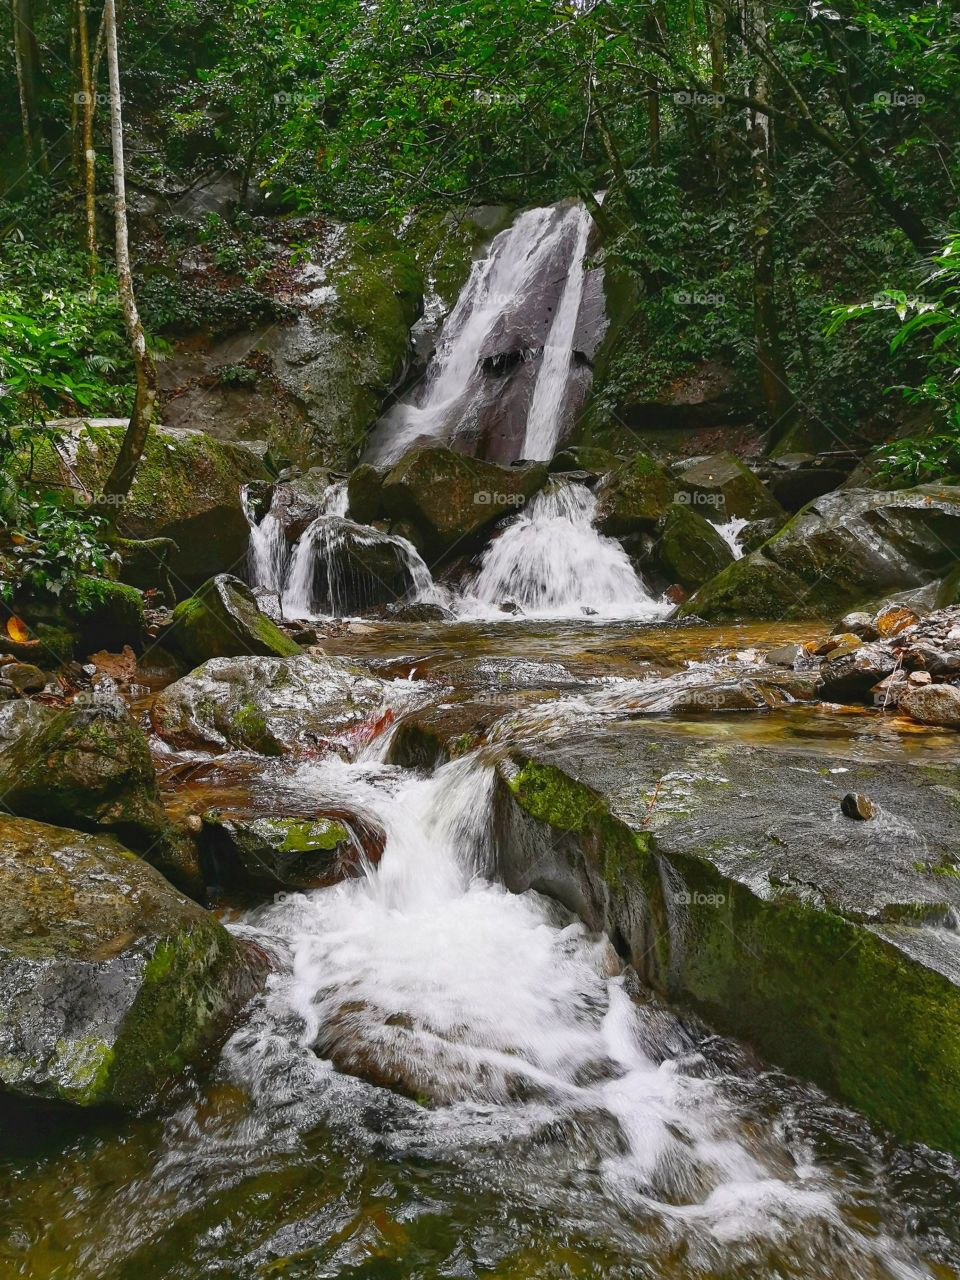 Sungai gabai waterfall